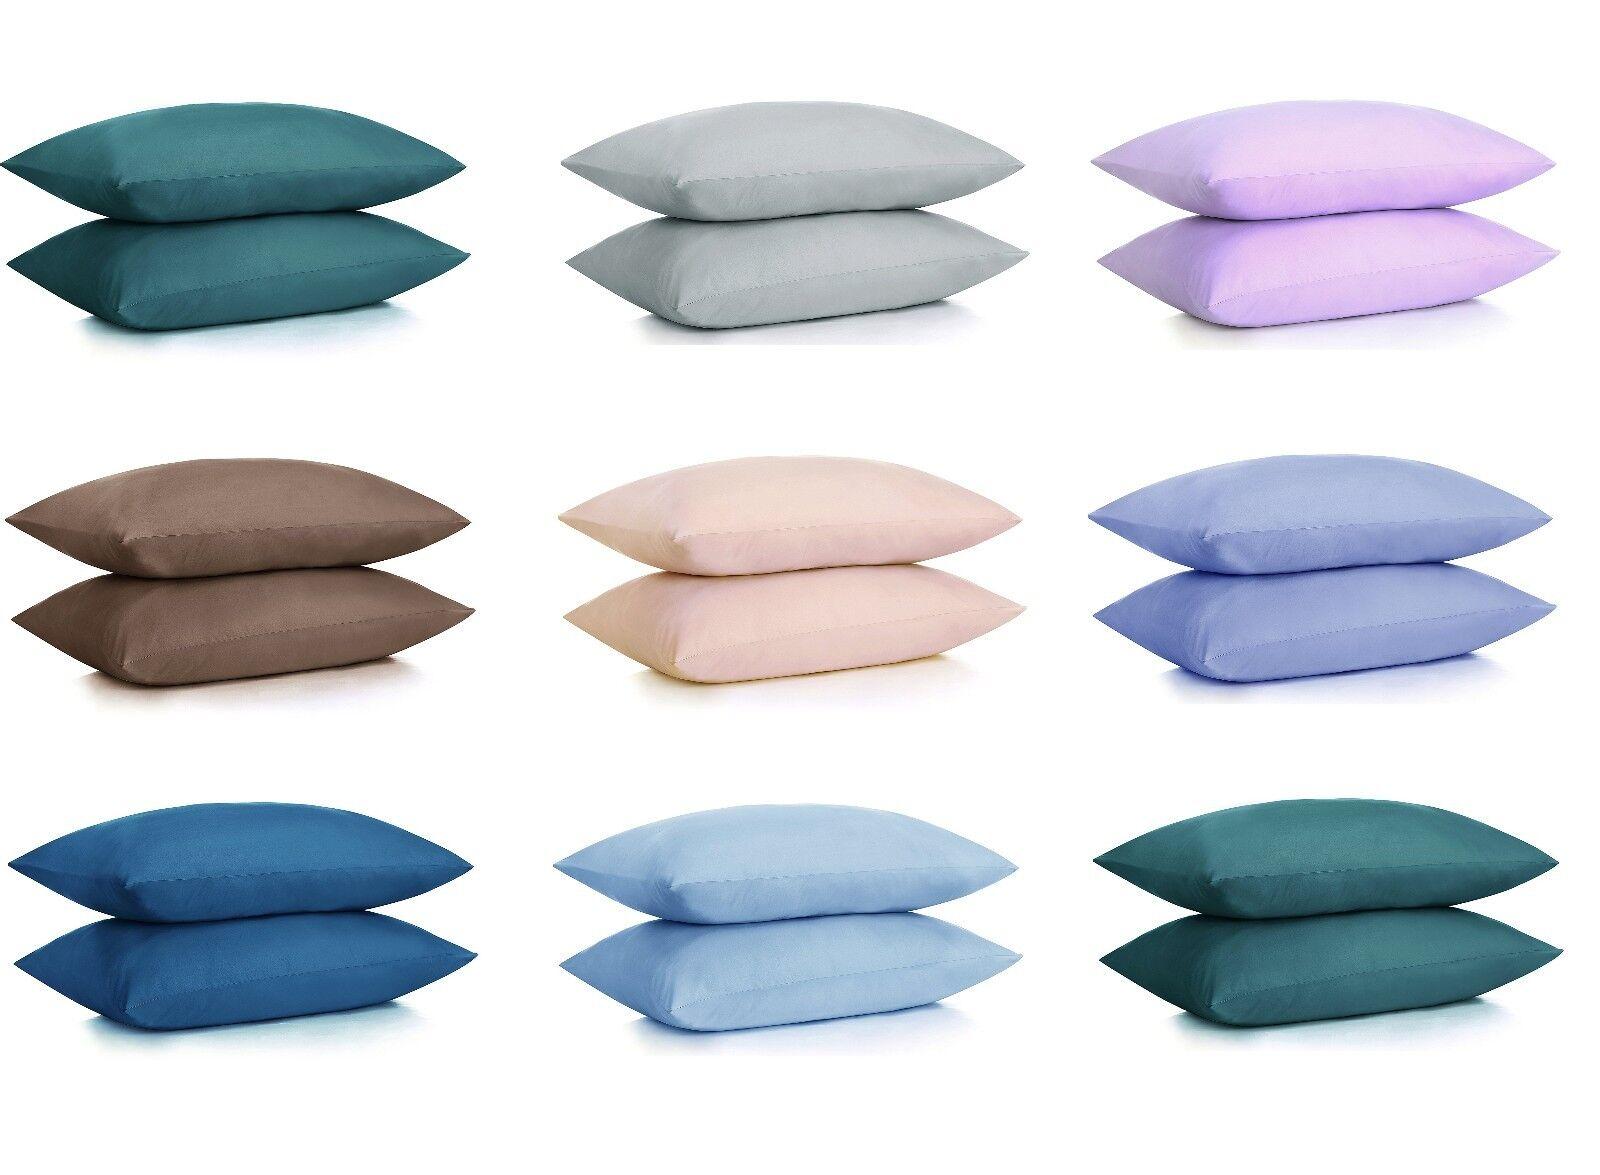 NEW ULTRA SOFT PILLOWCASES - 2 Pillow Cases Per Set Standard